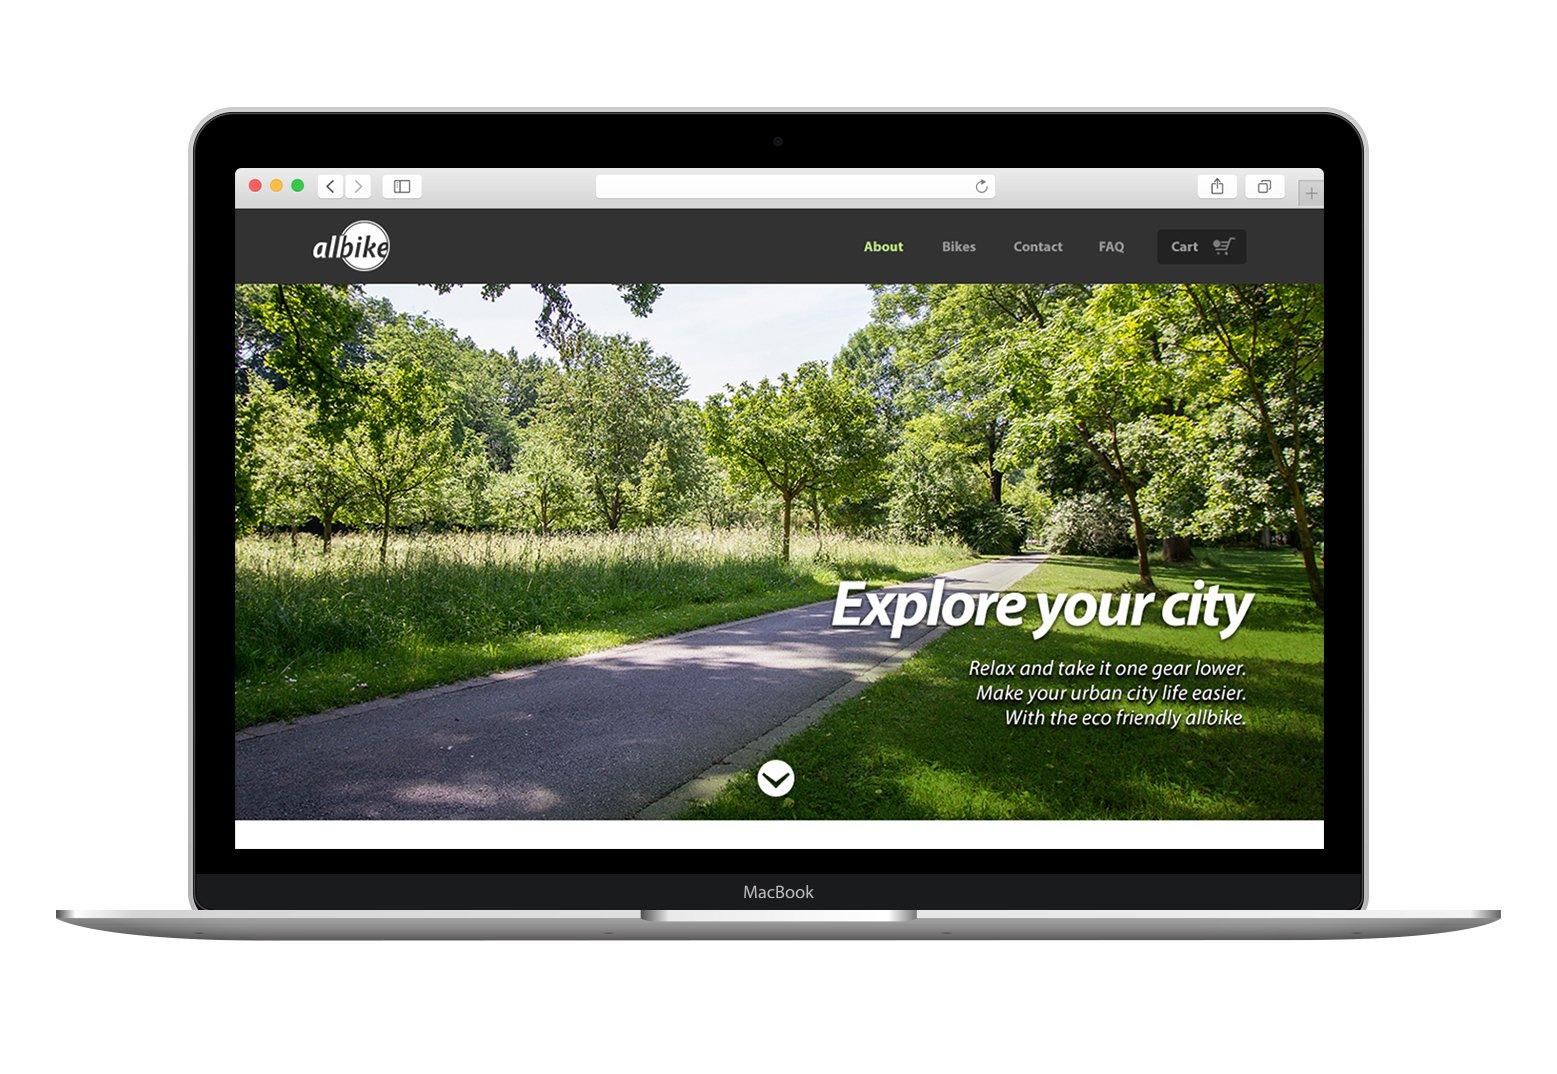 eco friendly bike shop website website templates creative market. Black Bedroom Furniture Sets. Home Design Ideas